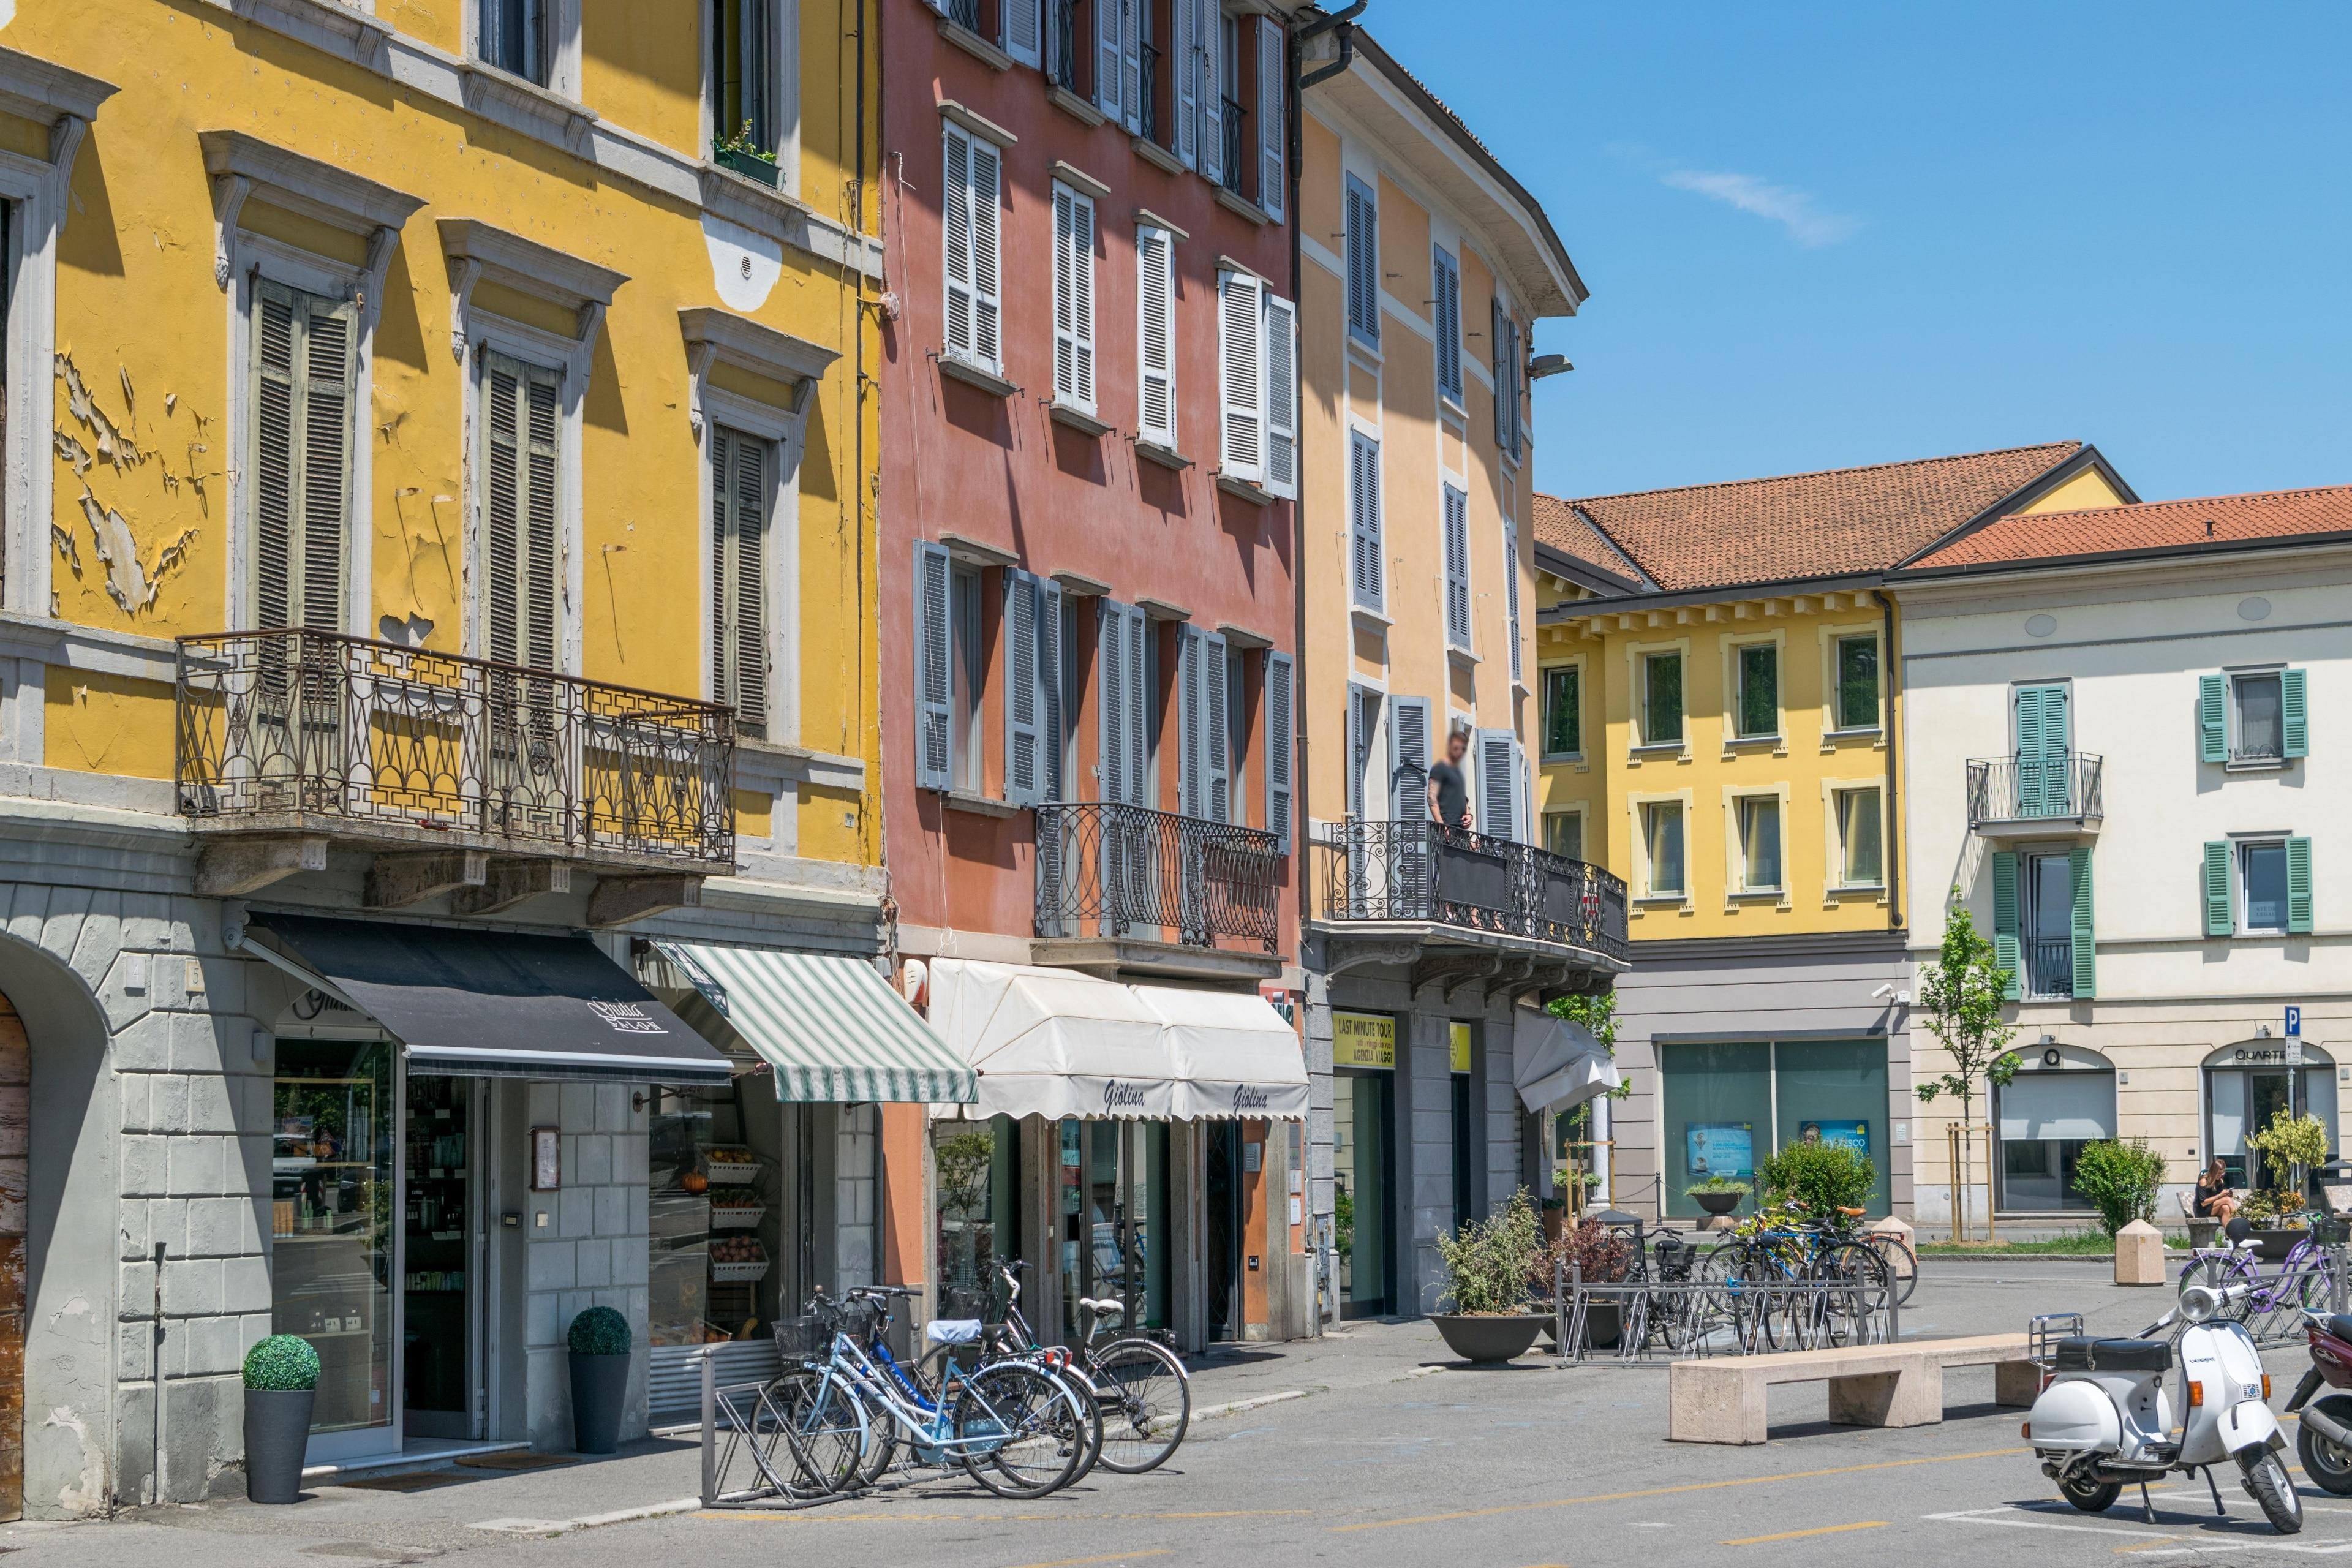 Crema, Lombardy, Italy